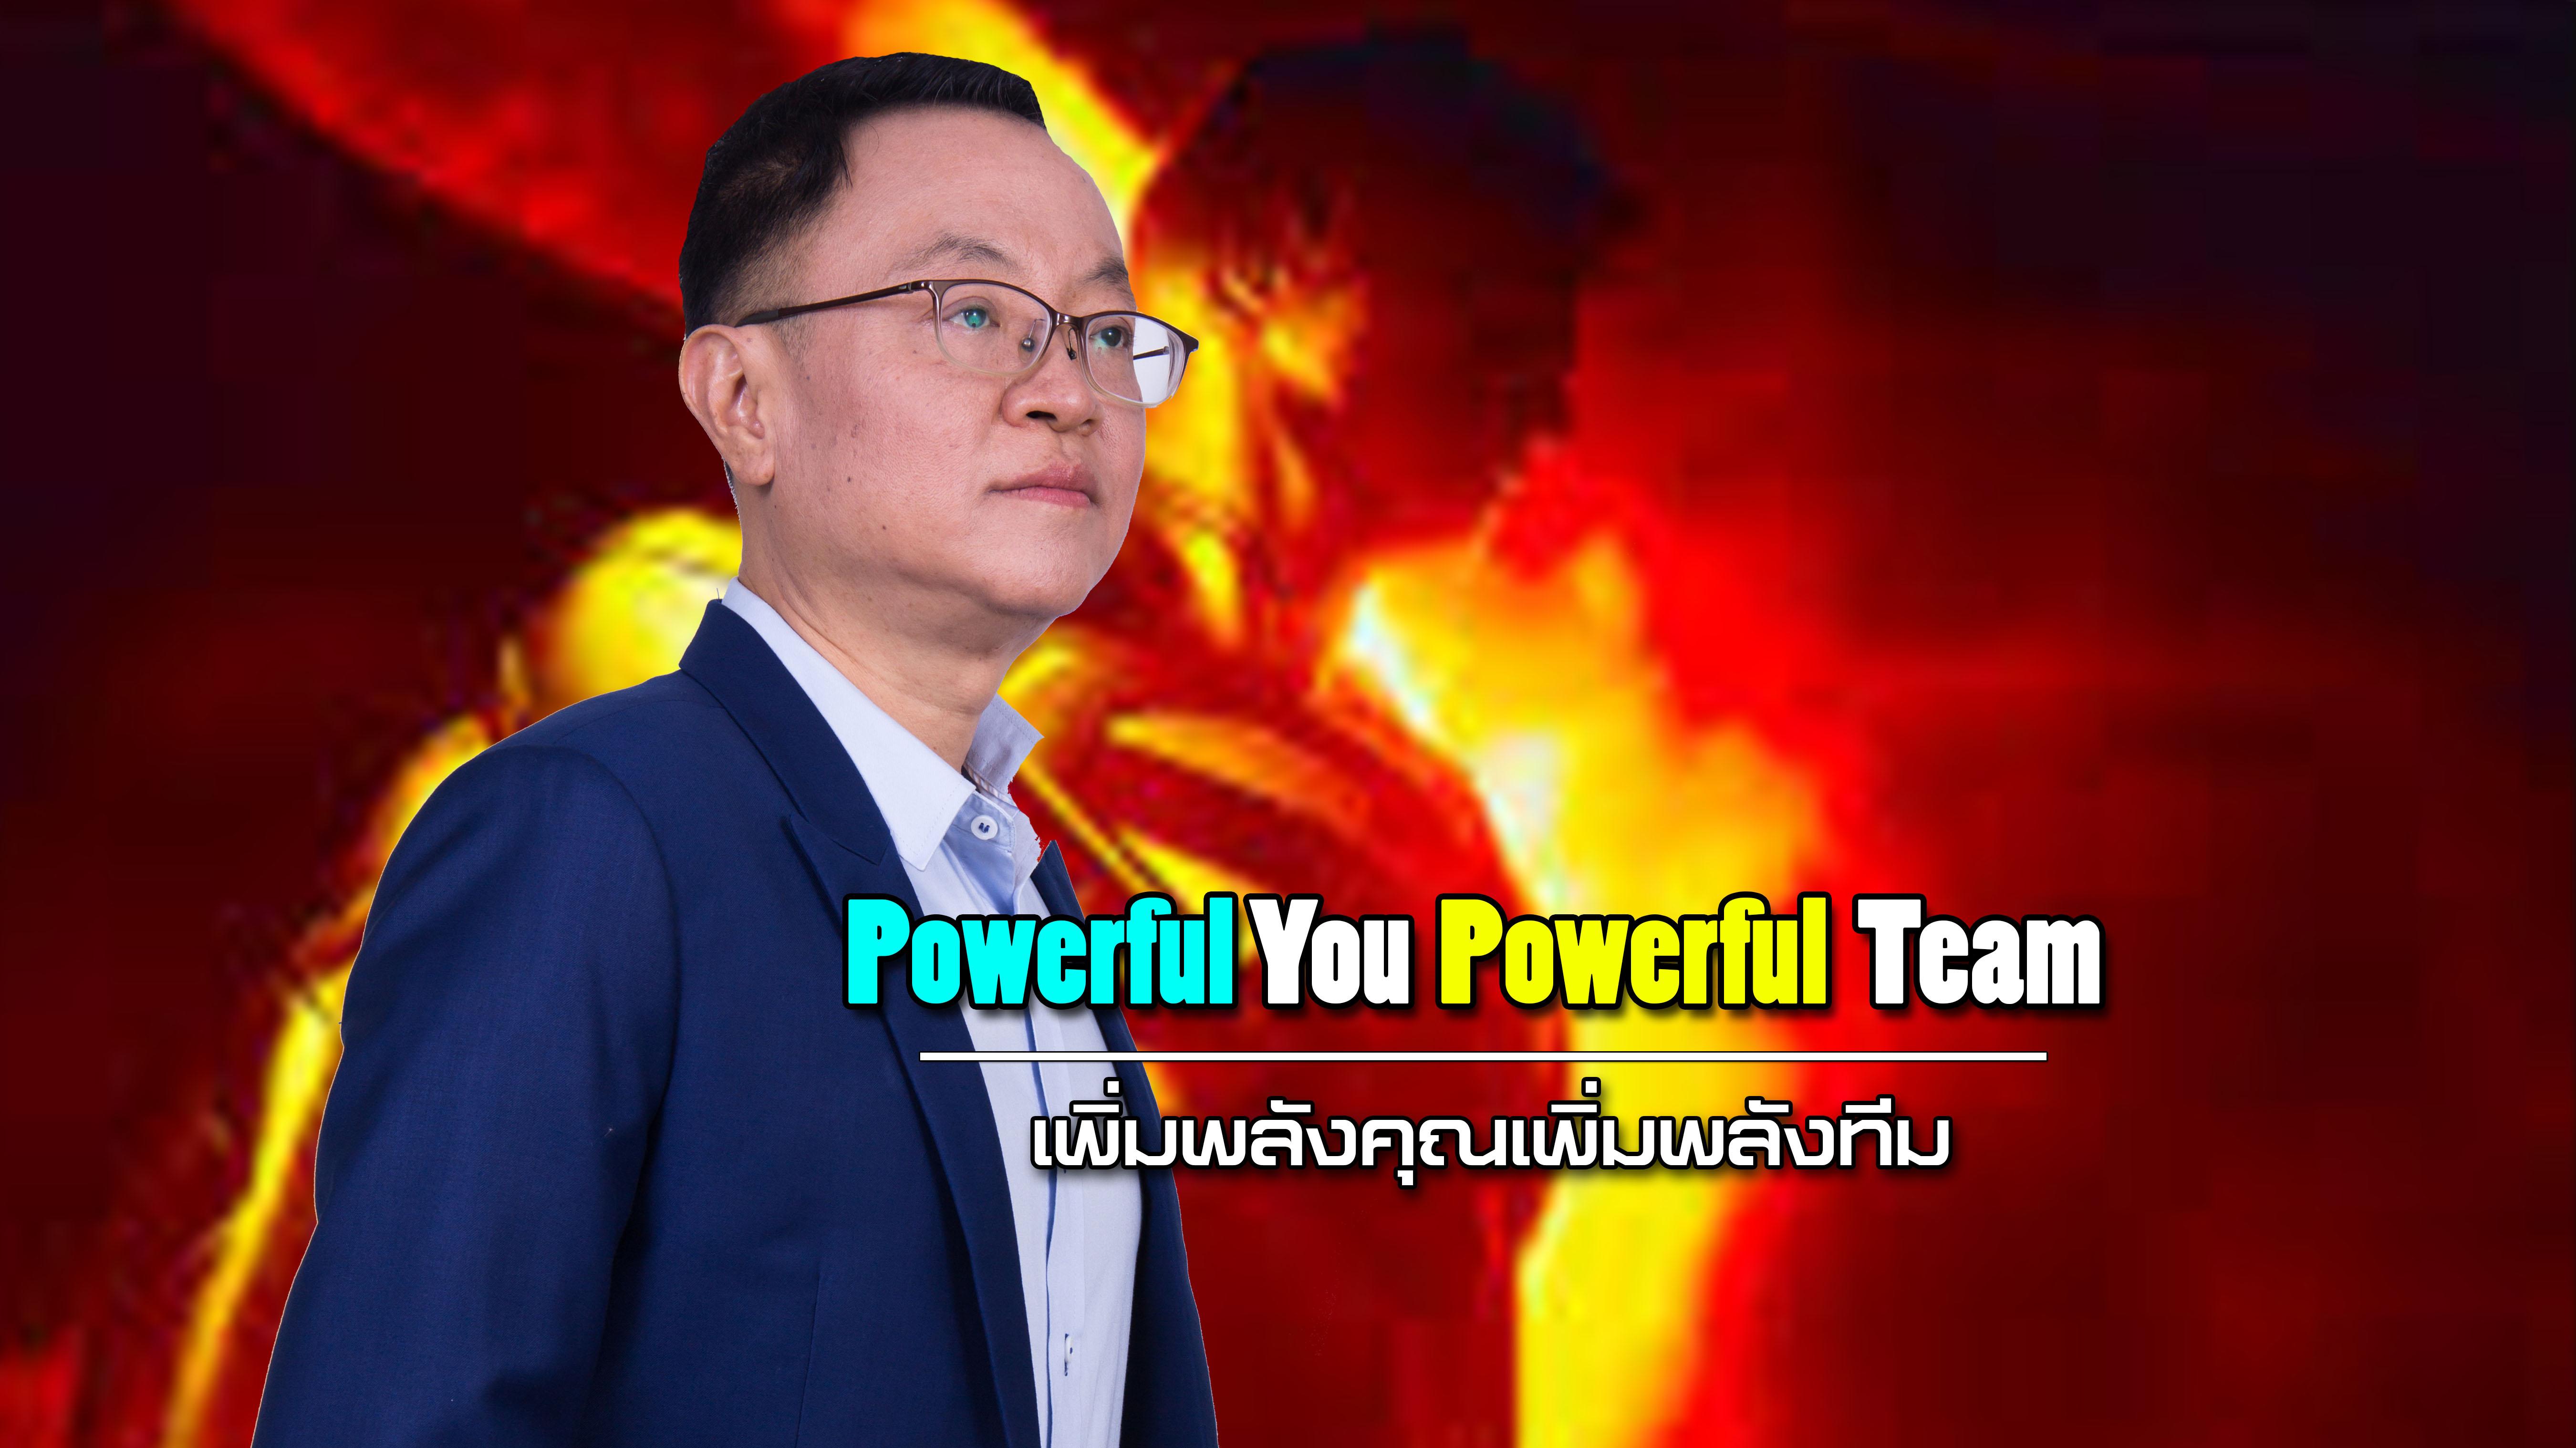 Powerful You Powerful Team